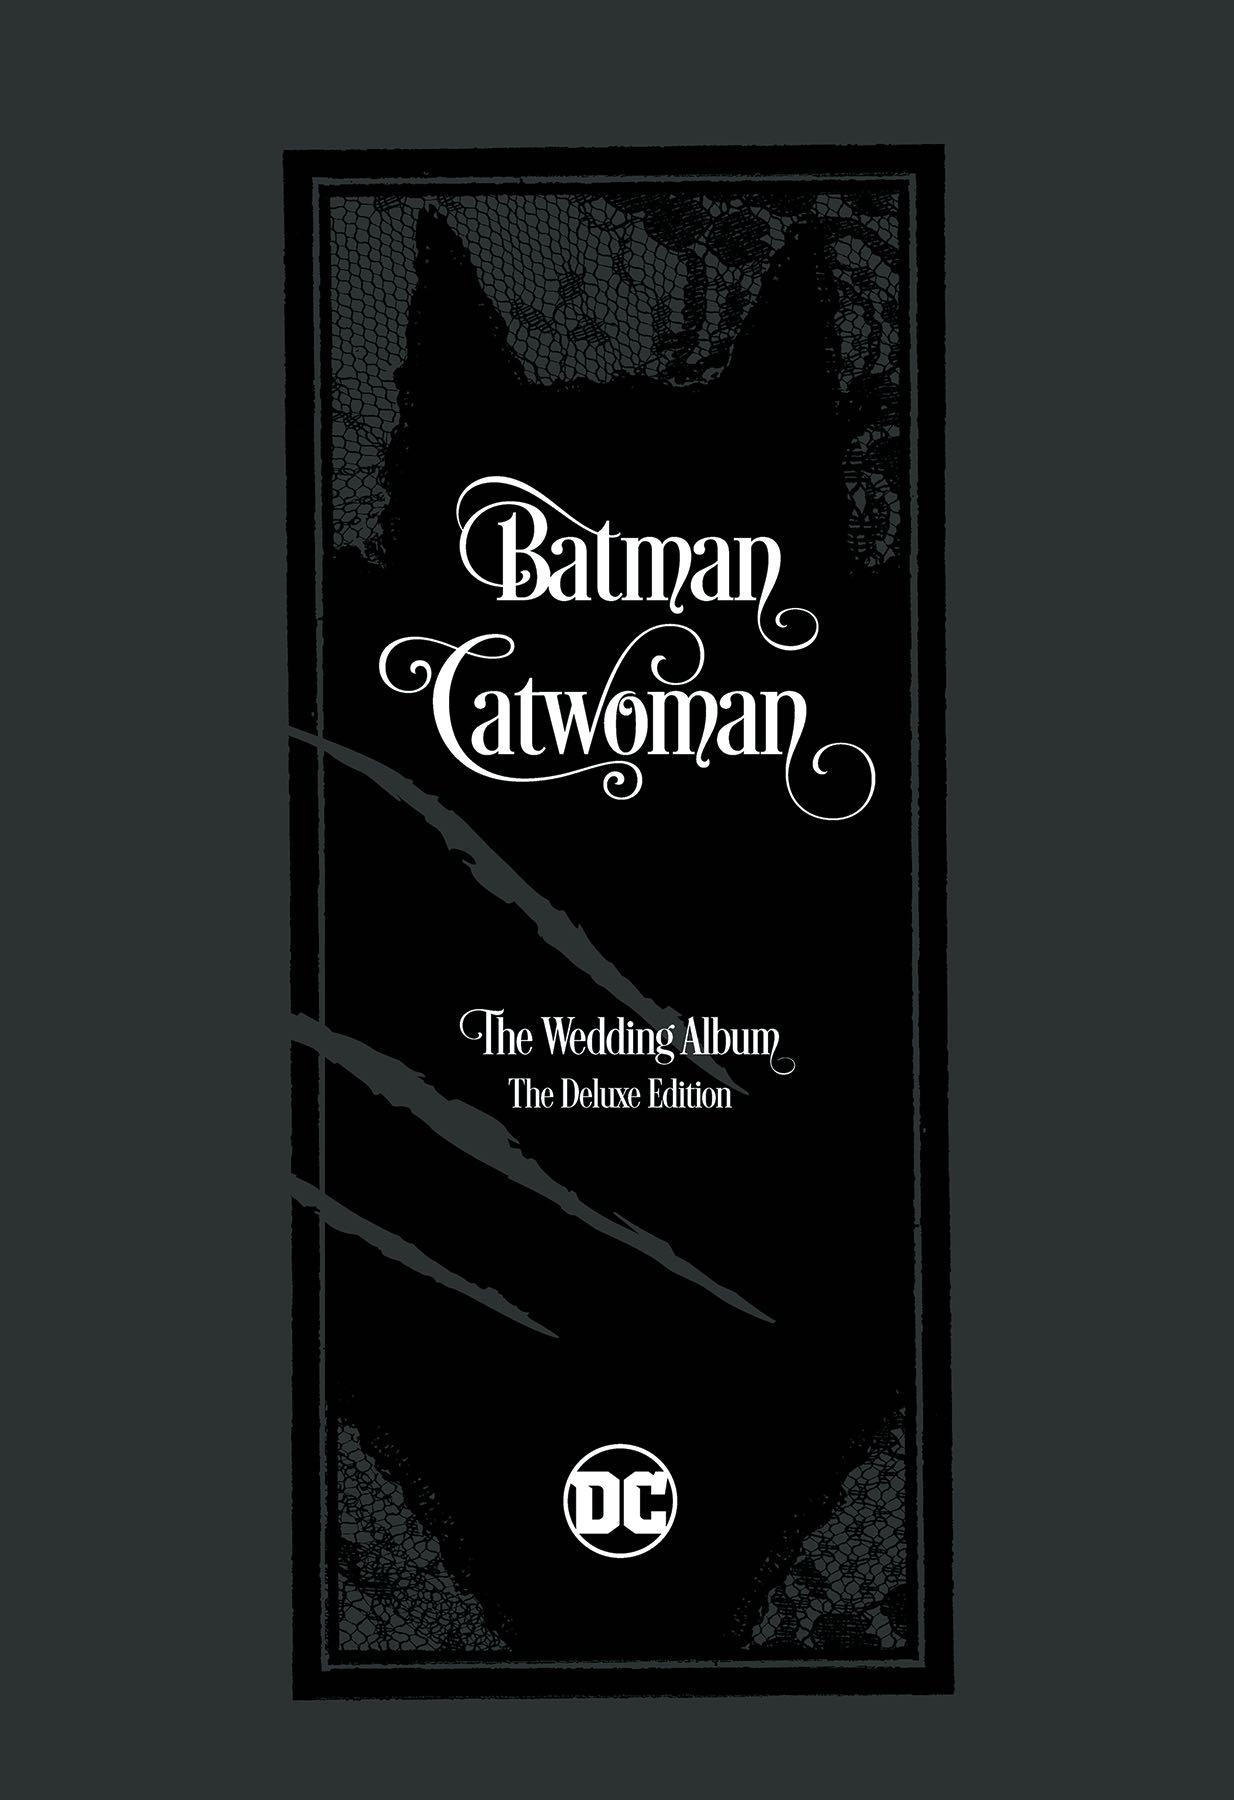 Batman Catwoman The Wedding Album The Deluxe Edition